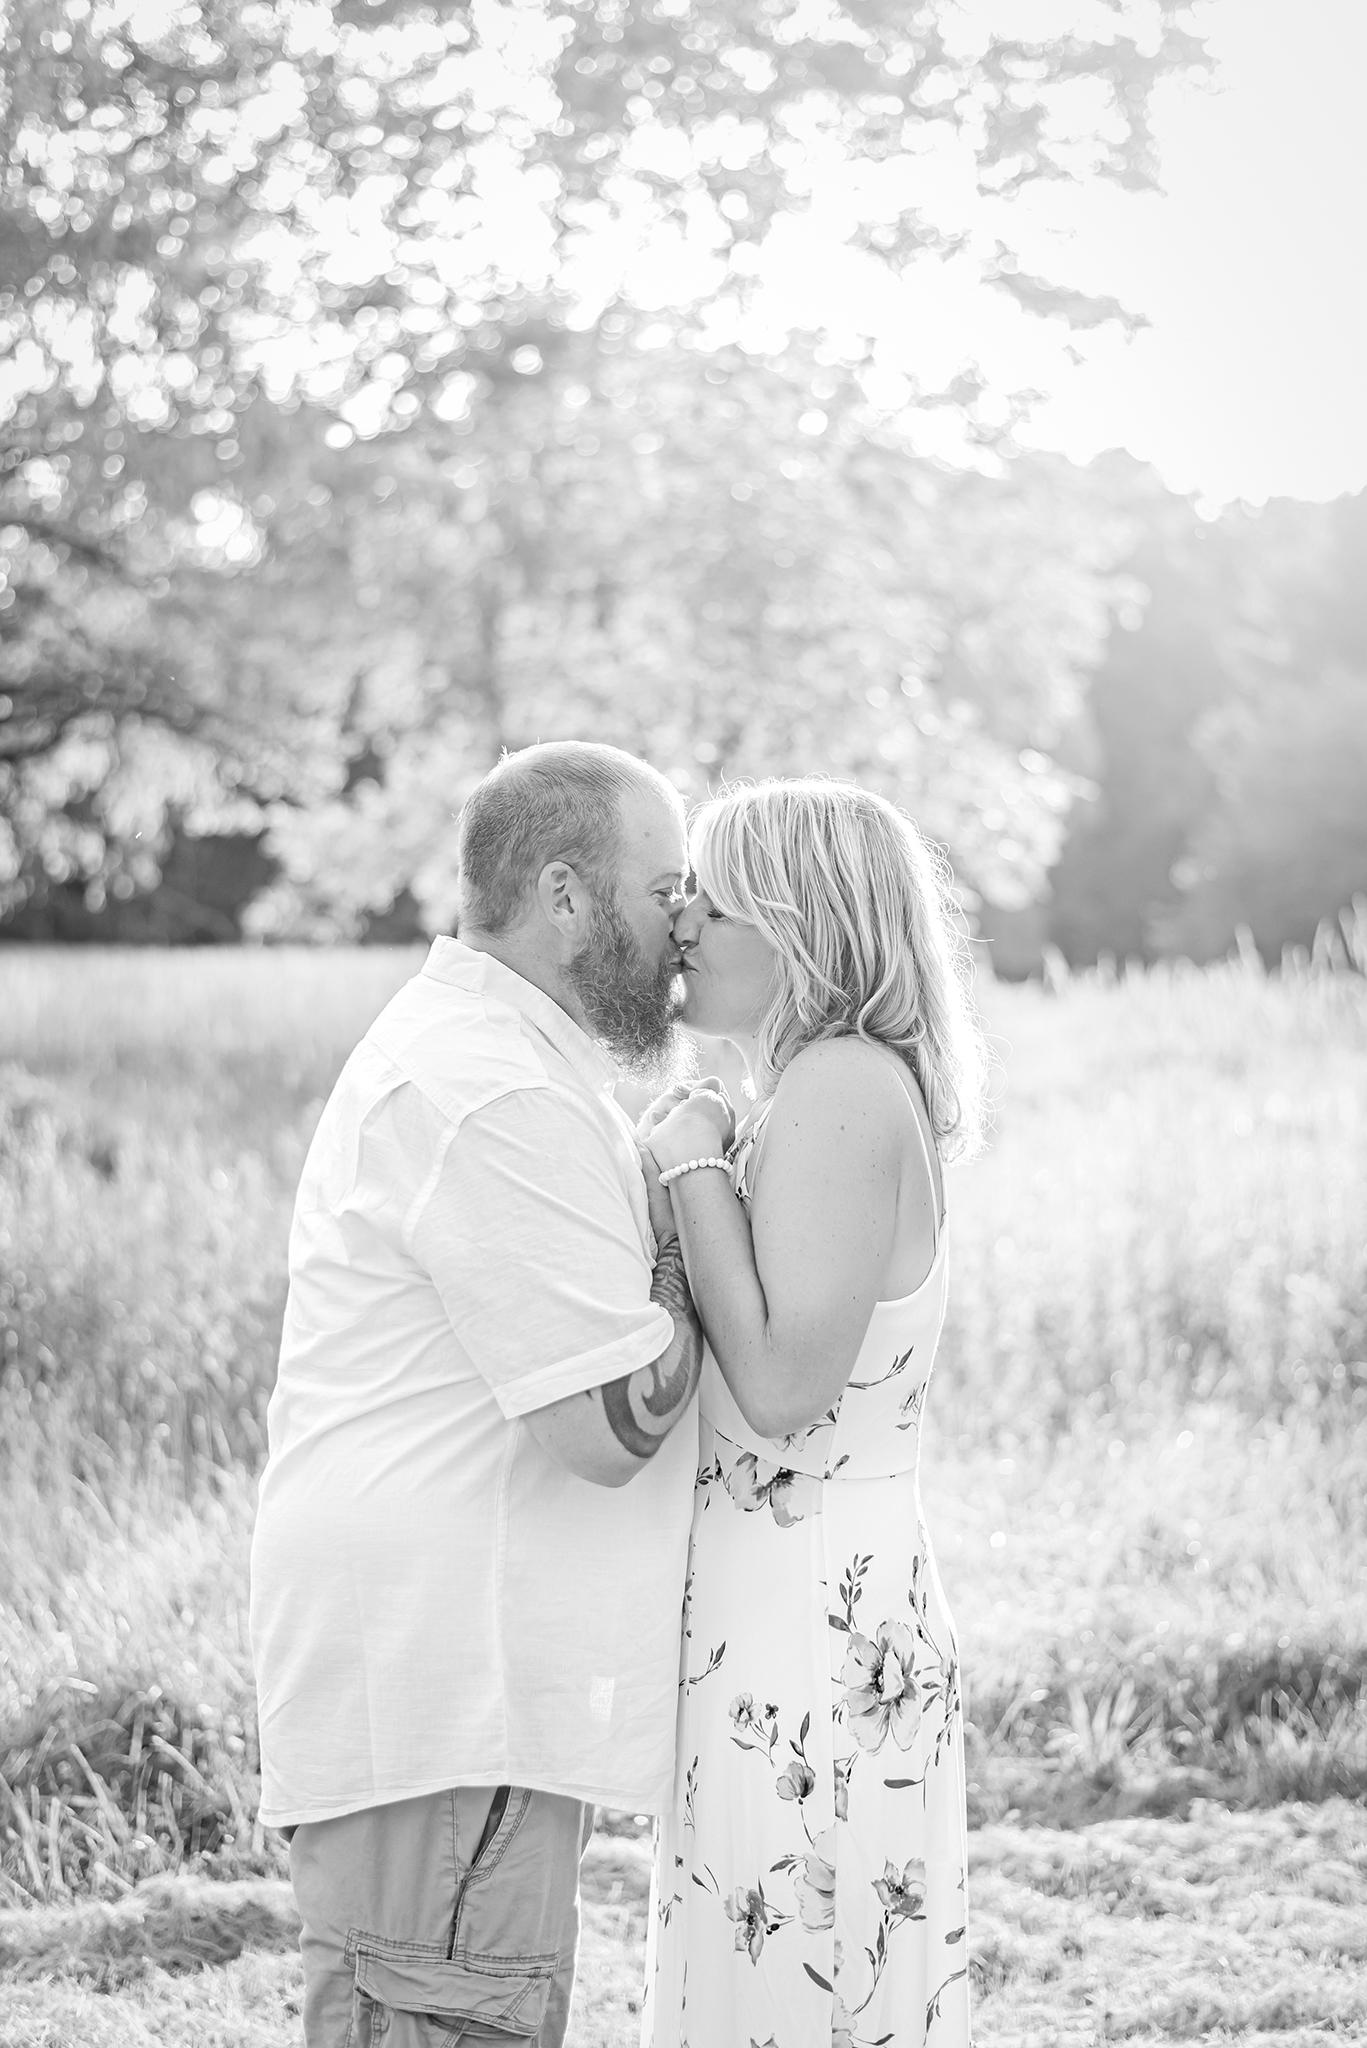 Lindsay-Adkins-Photography-Michigan-Engagement-And-Wedding-Photographer9